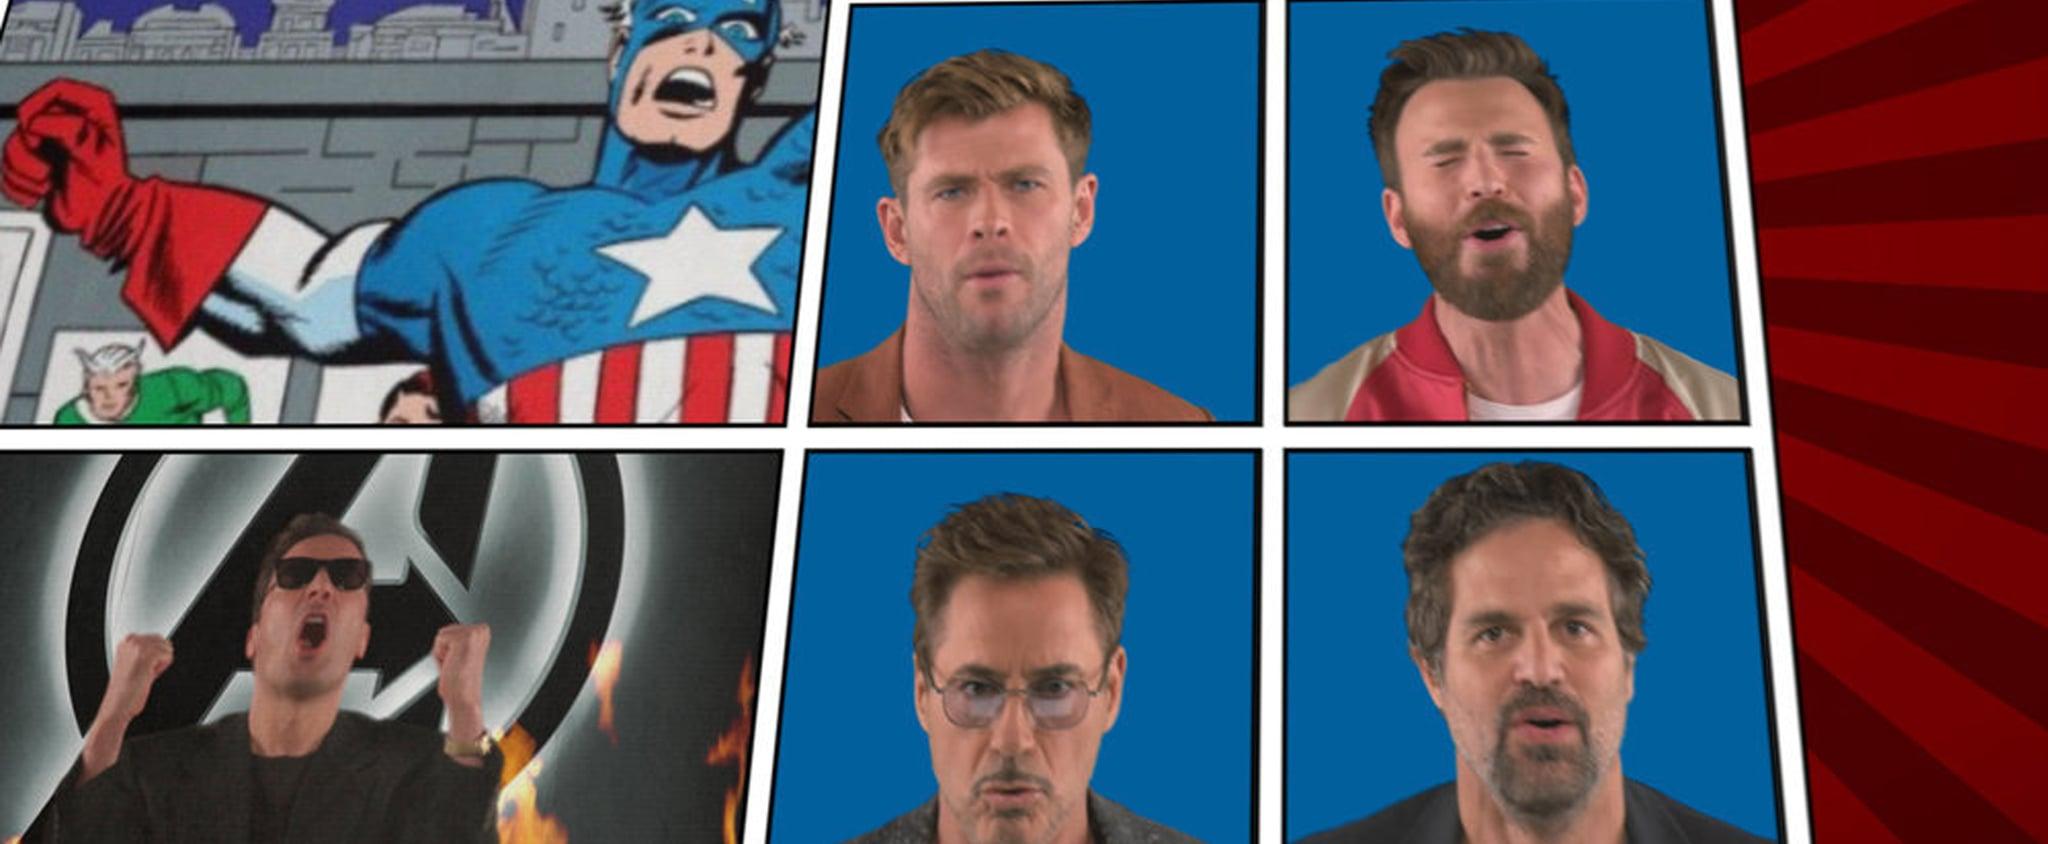 "Avengers Cast ""We Didn't Start the Fire"" Tonight Show Video"